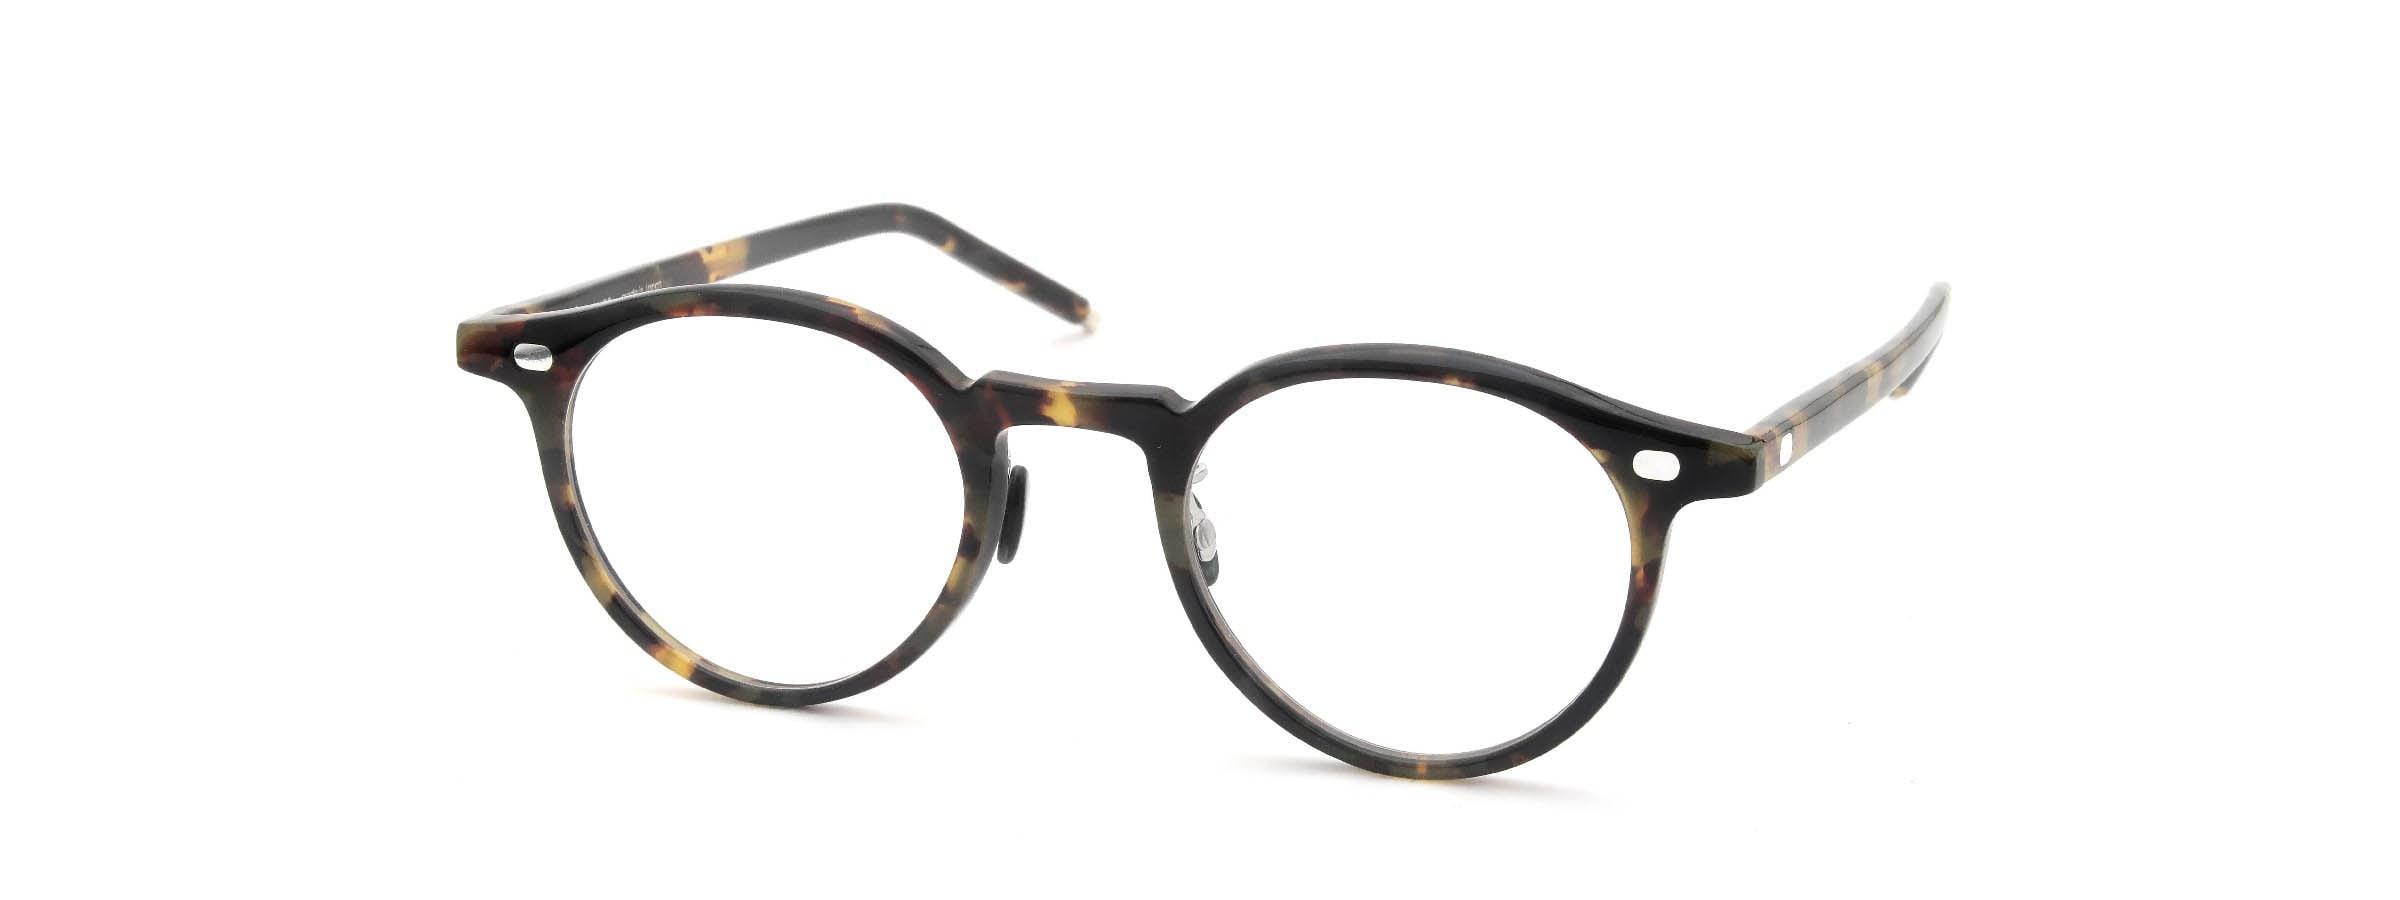 10 eyevan NO.3 Ⅲ 45size